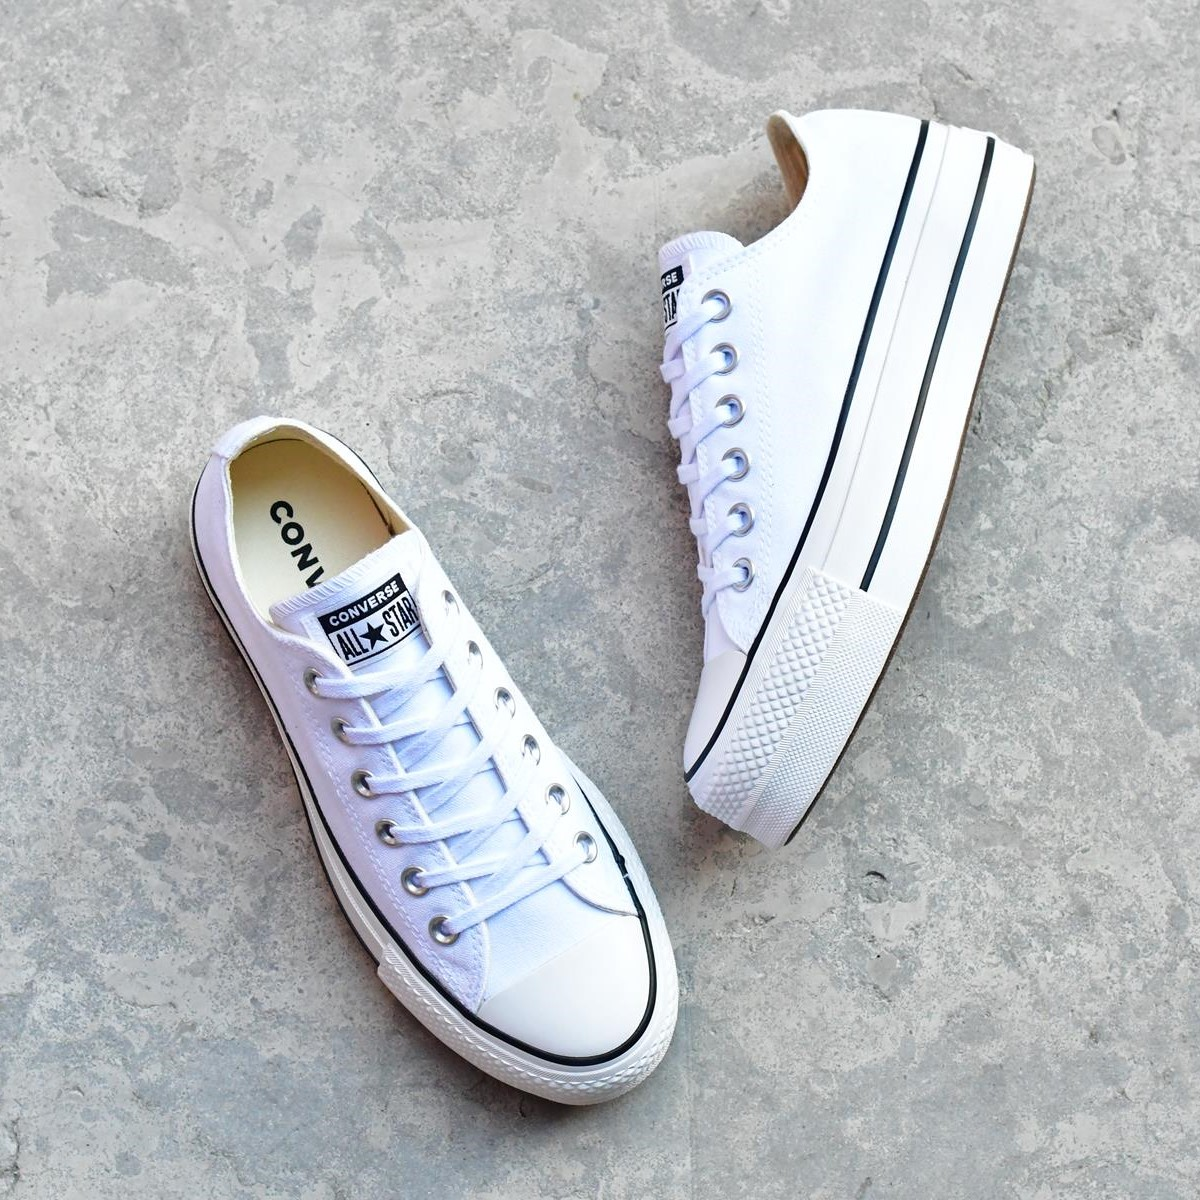 560251c_amorshoes-converse-chuck-taylor-all-star-ctas-lift-ox-plataforma-white-blanca-lona-suela-blanca-560251c